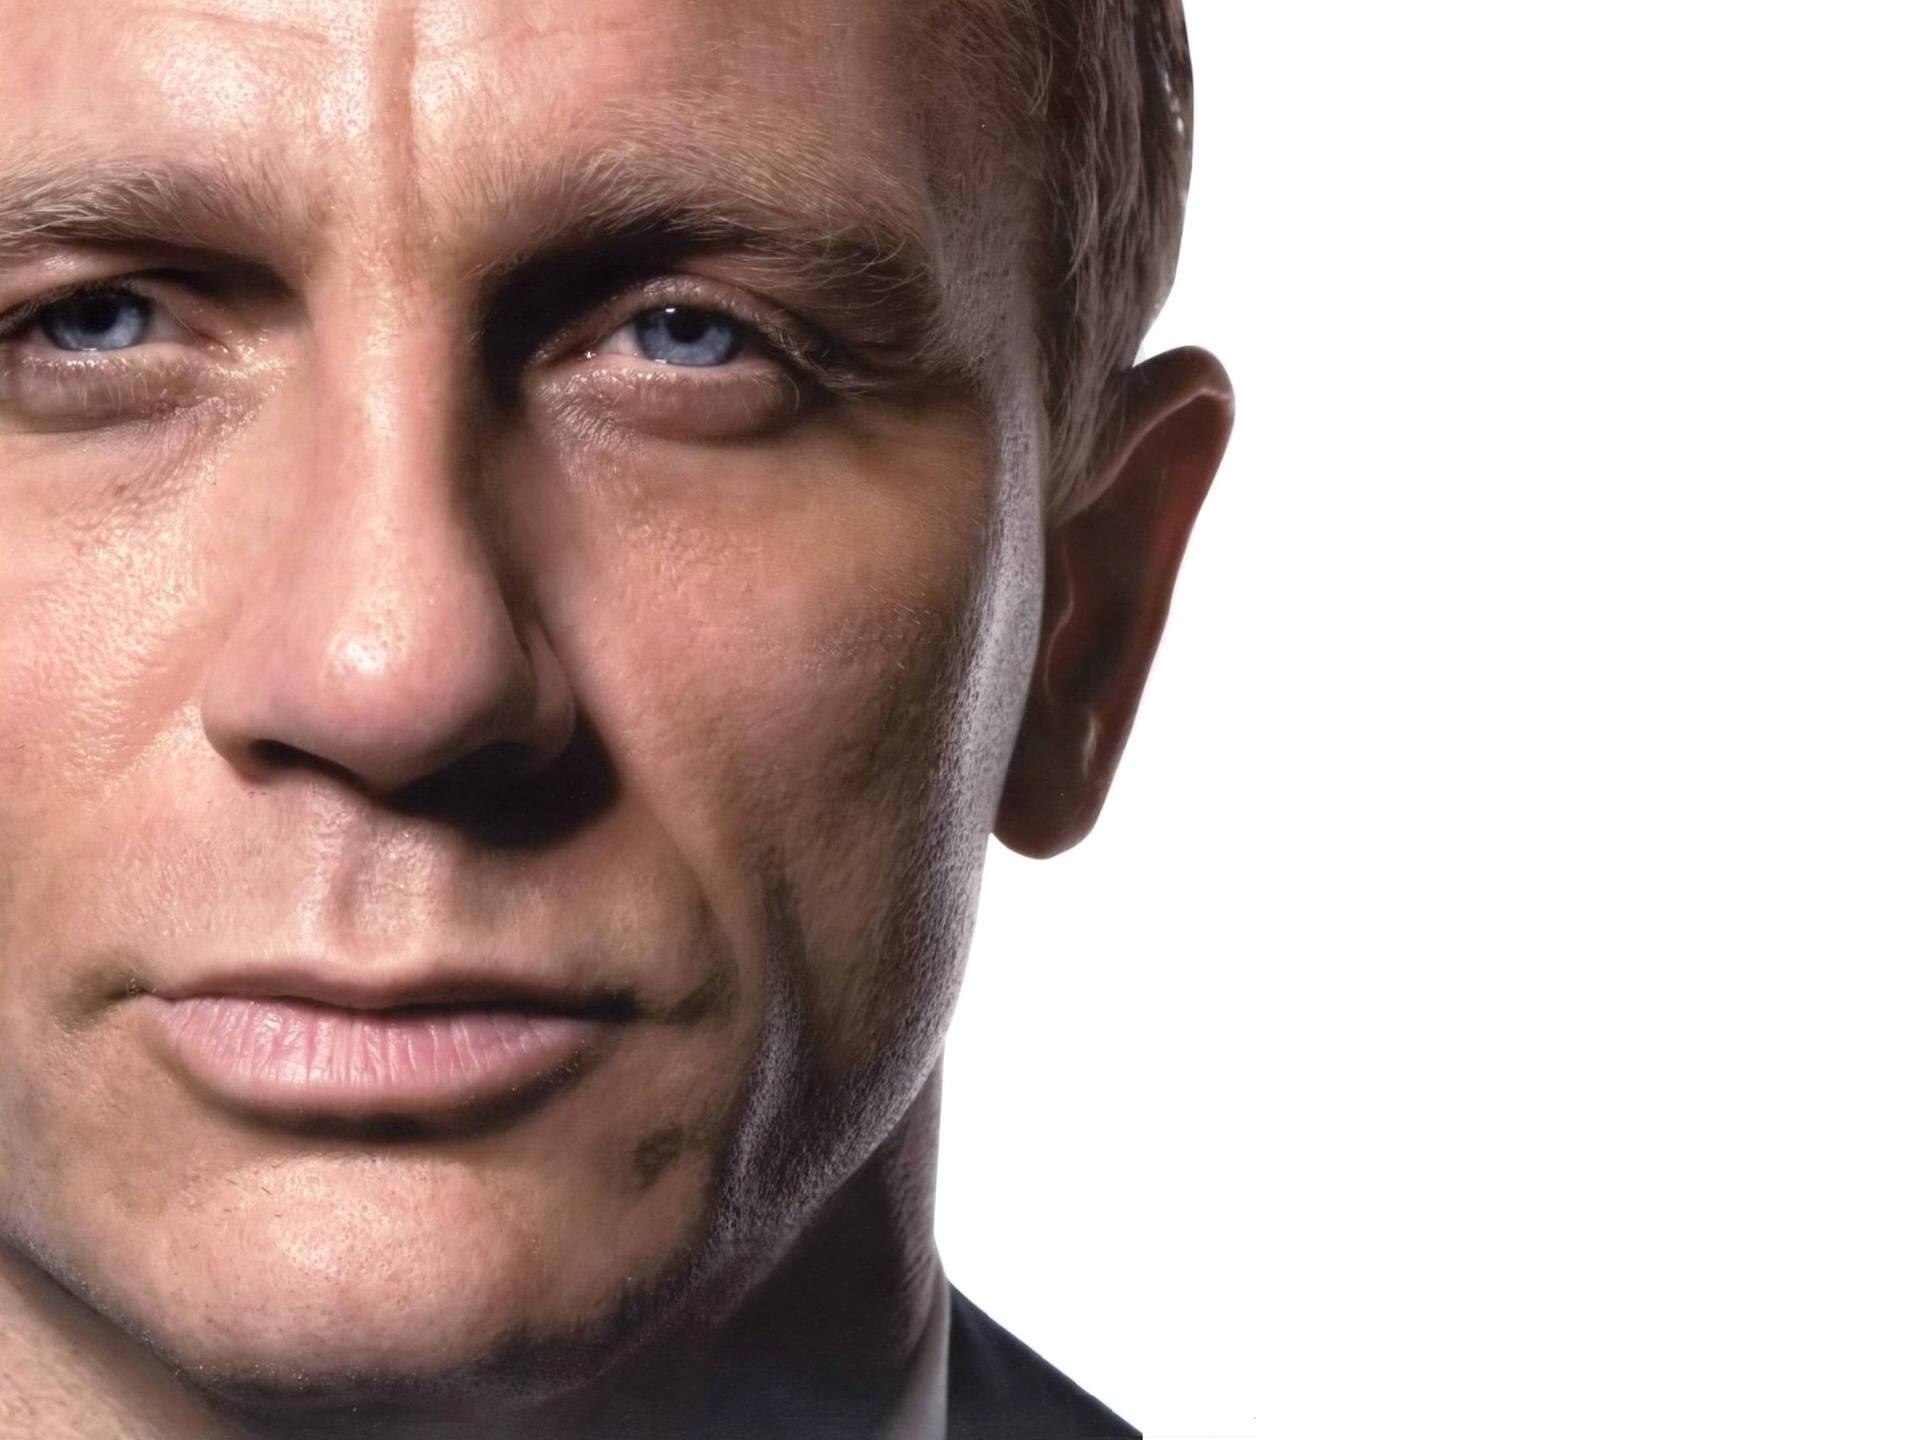 ... daniel craig imagearticle ajust daniel craig daniel craig tags daniel Daniel Craig